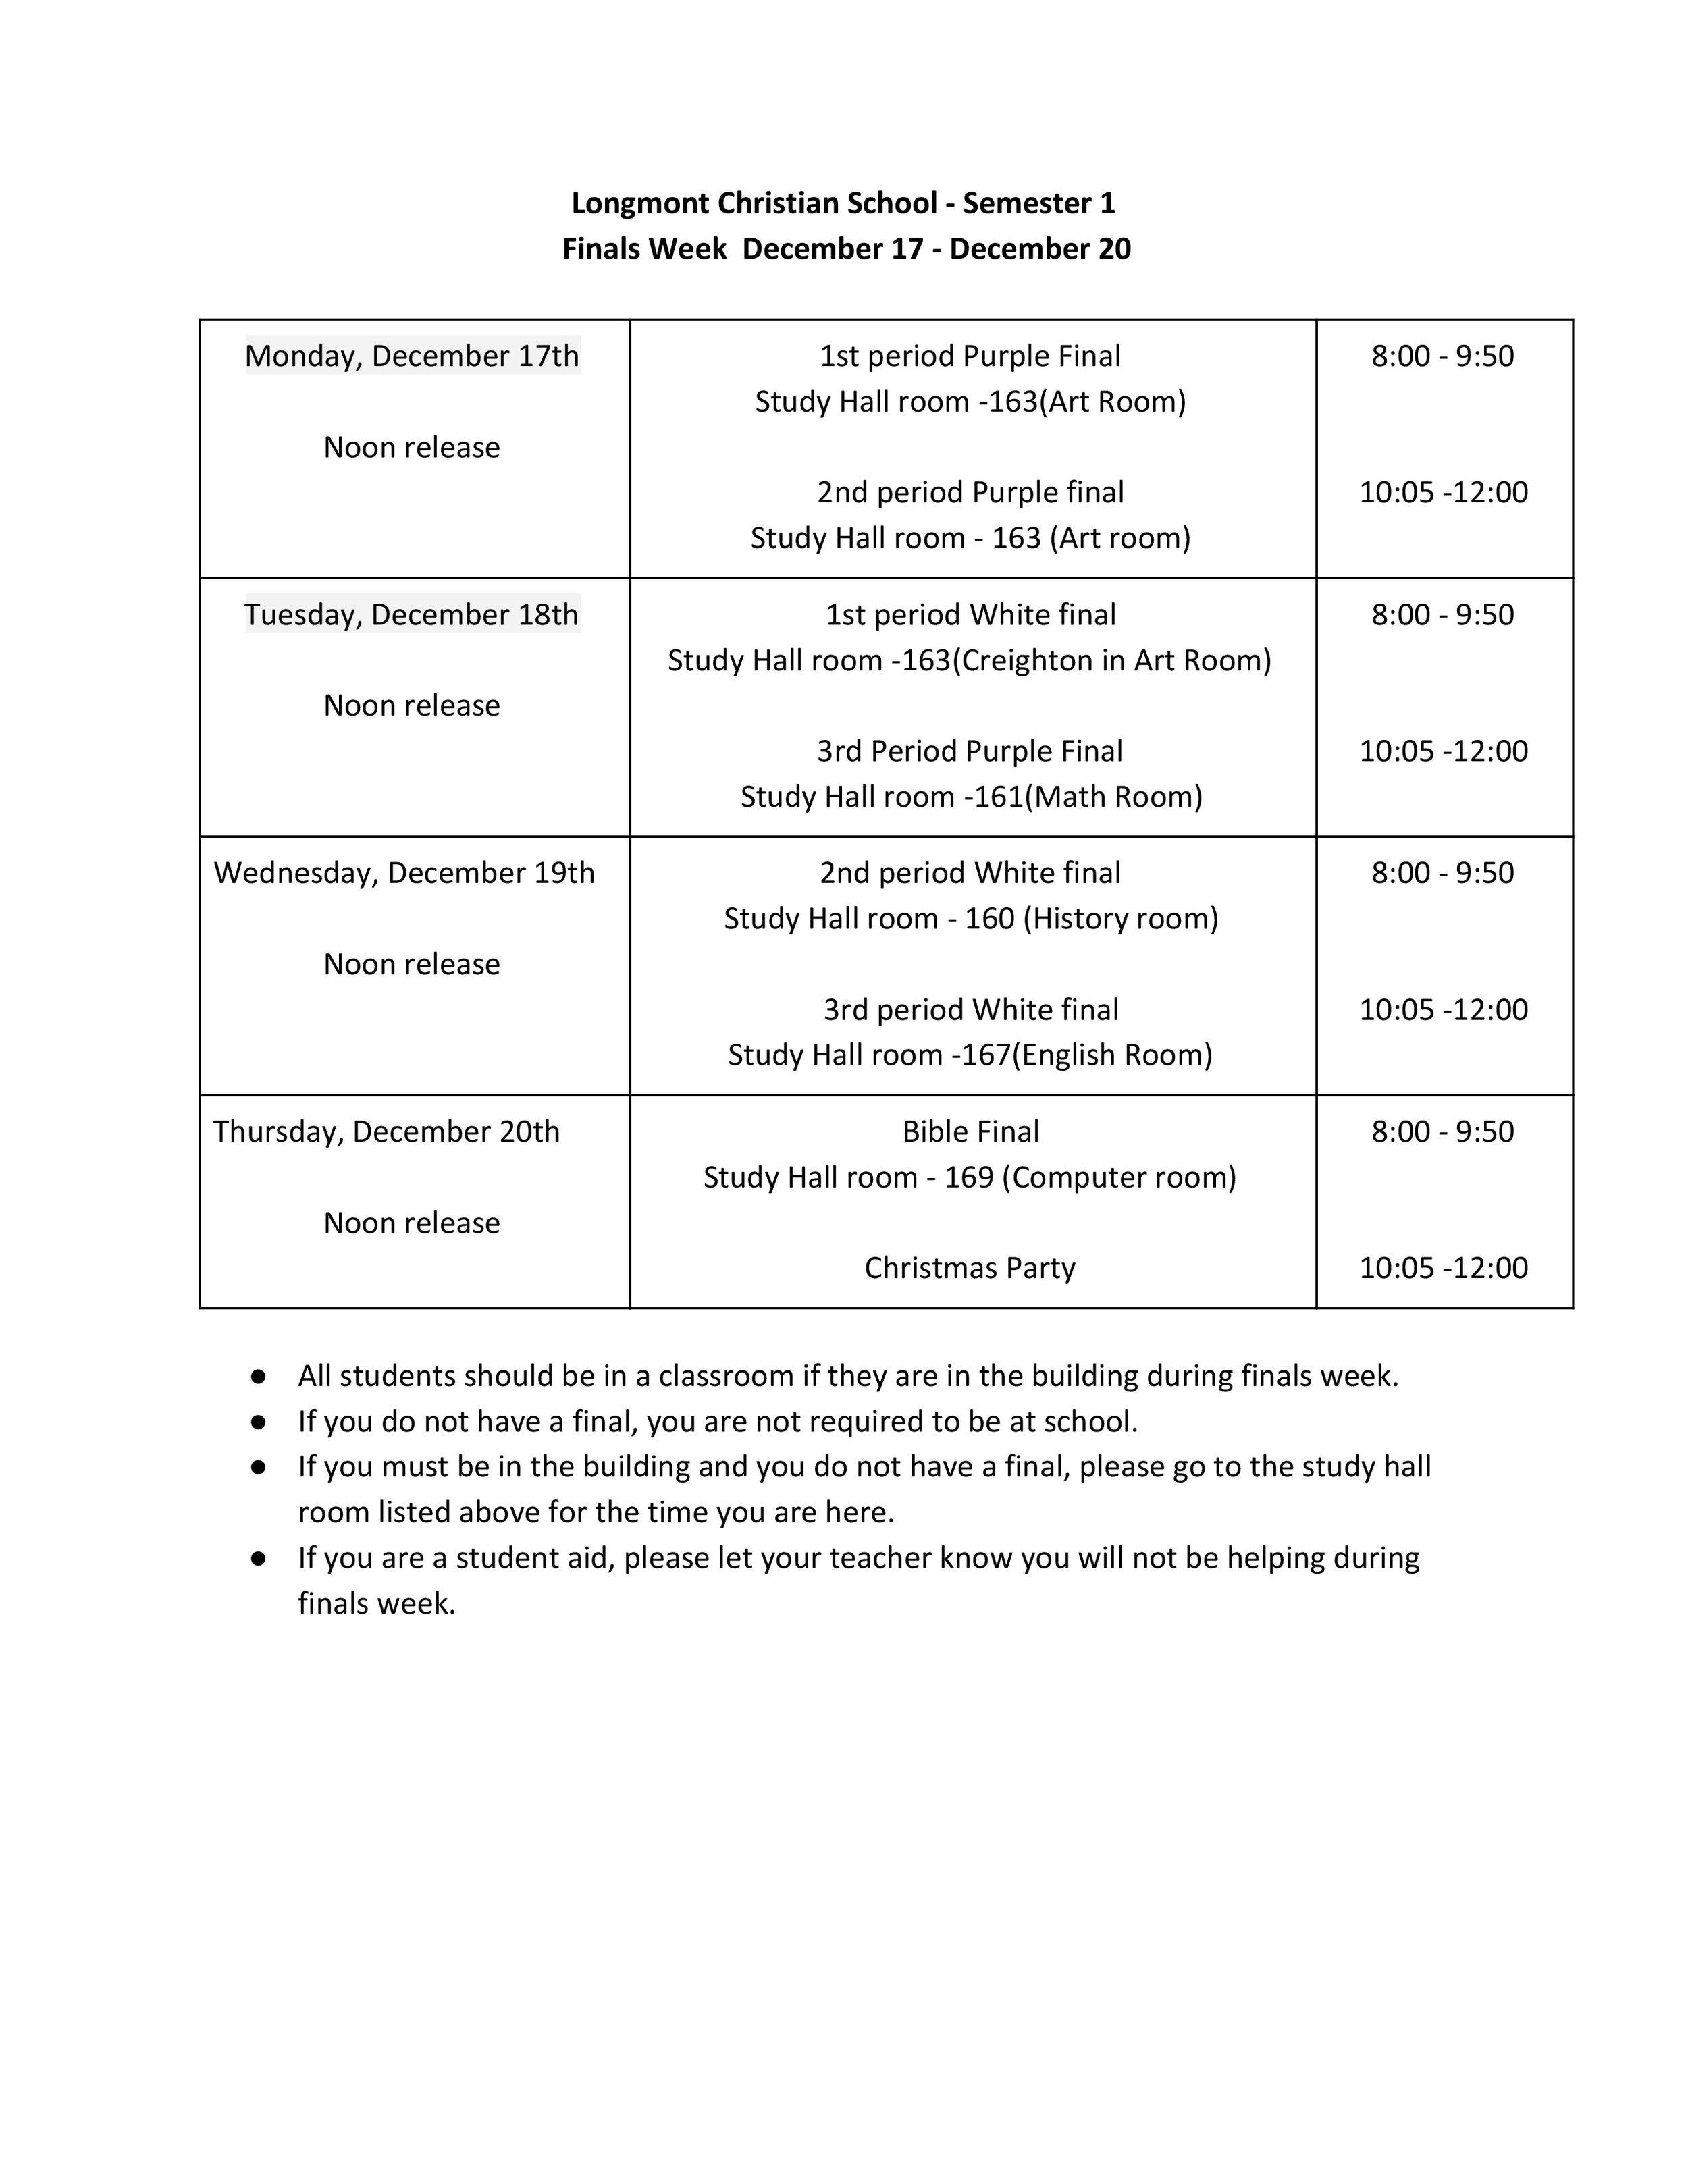 Semester 1 - 2018-19 Finals schedule-page-0.jpg